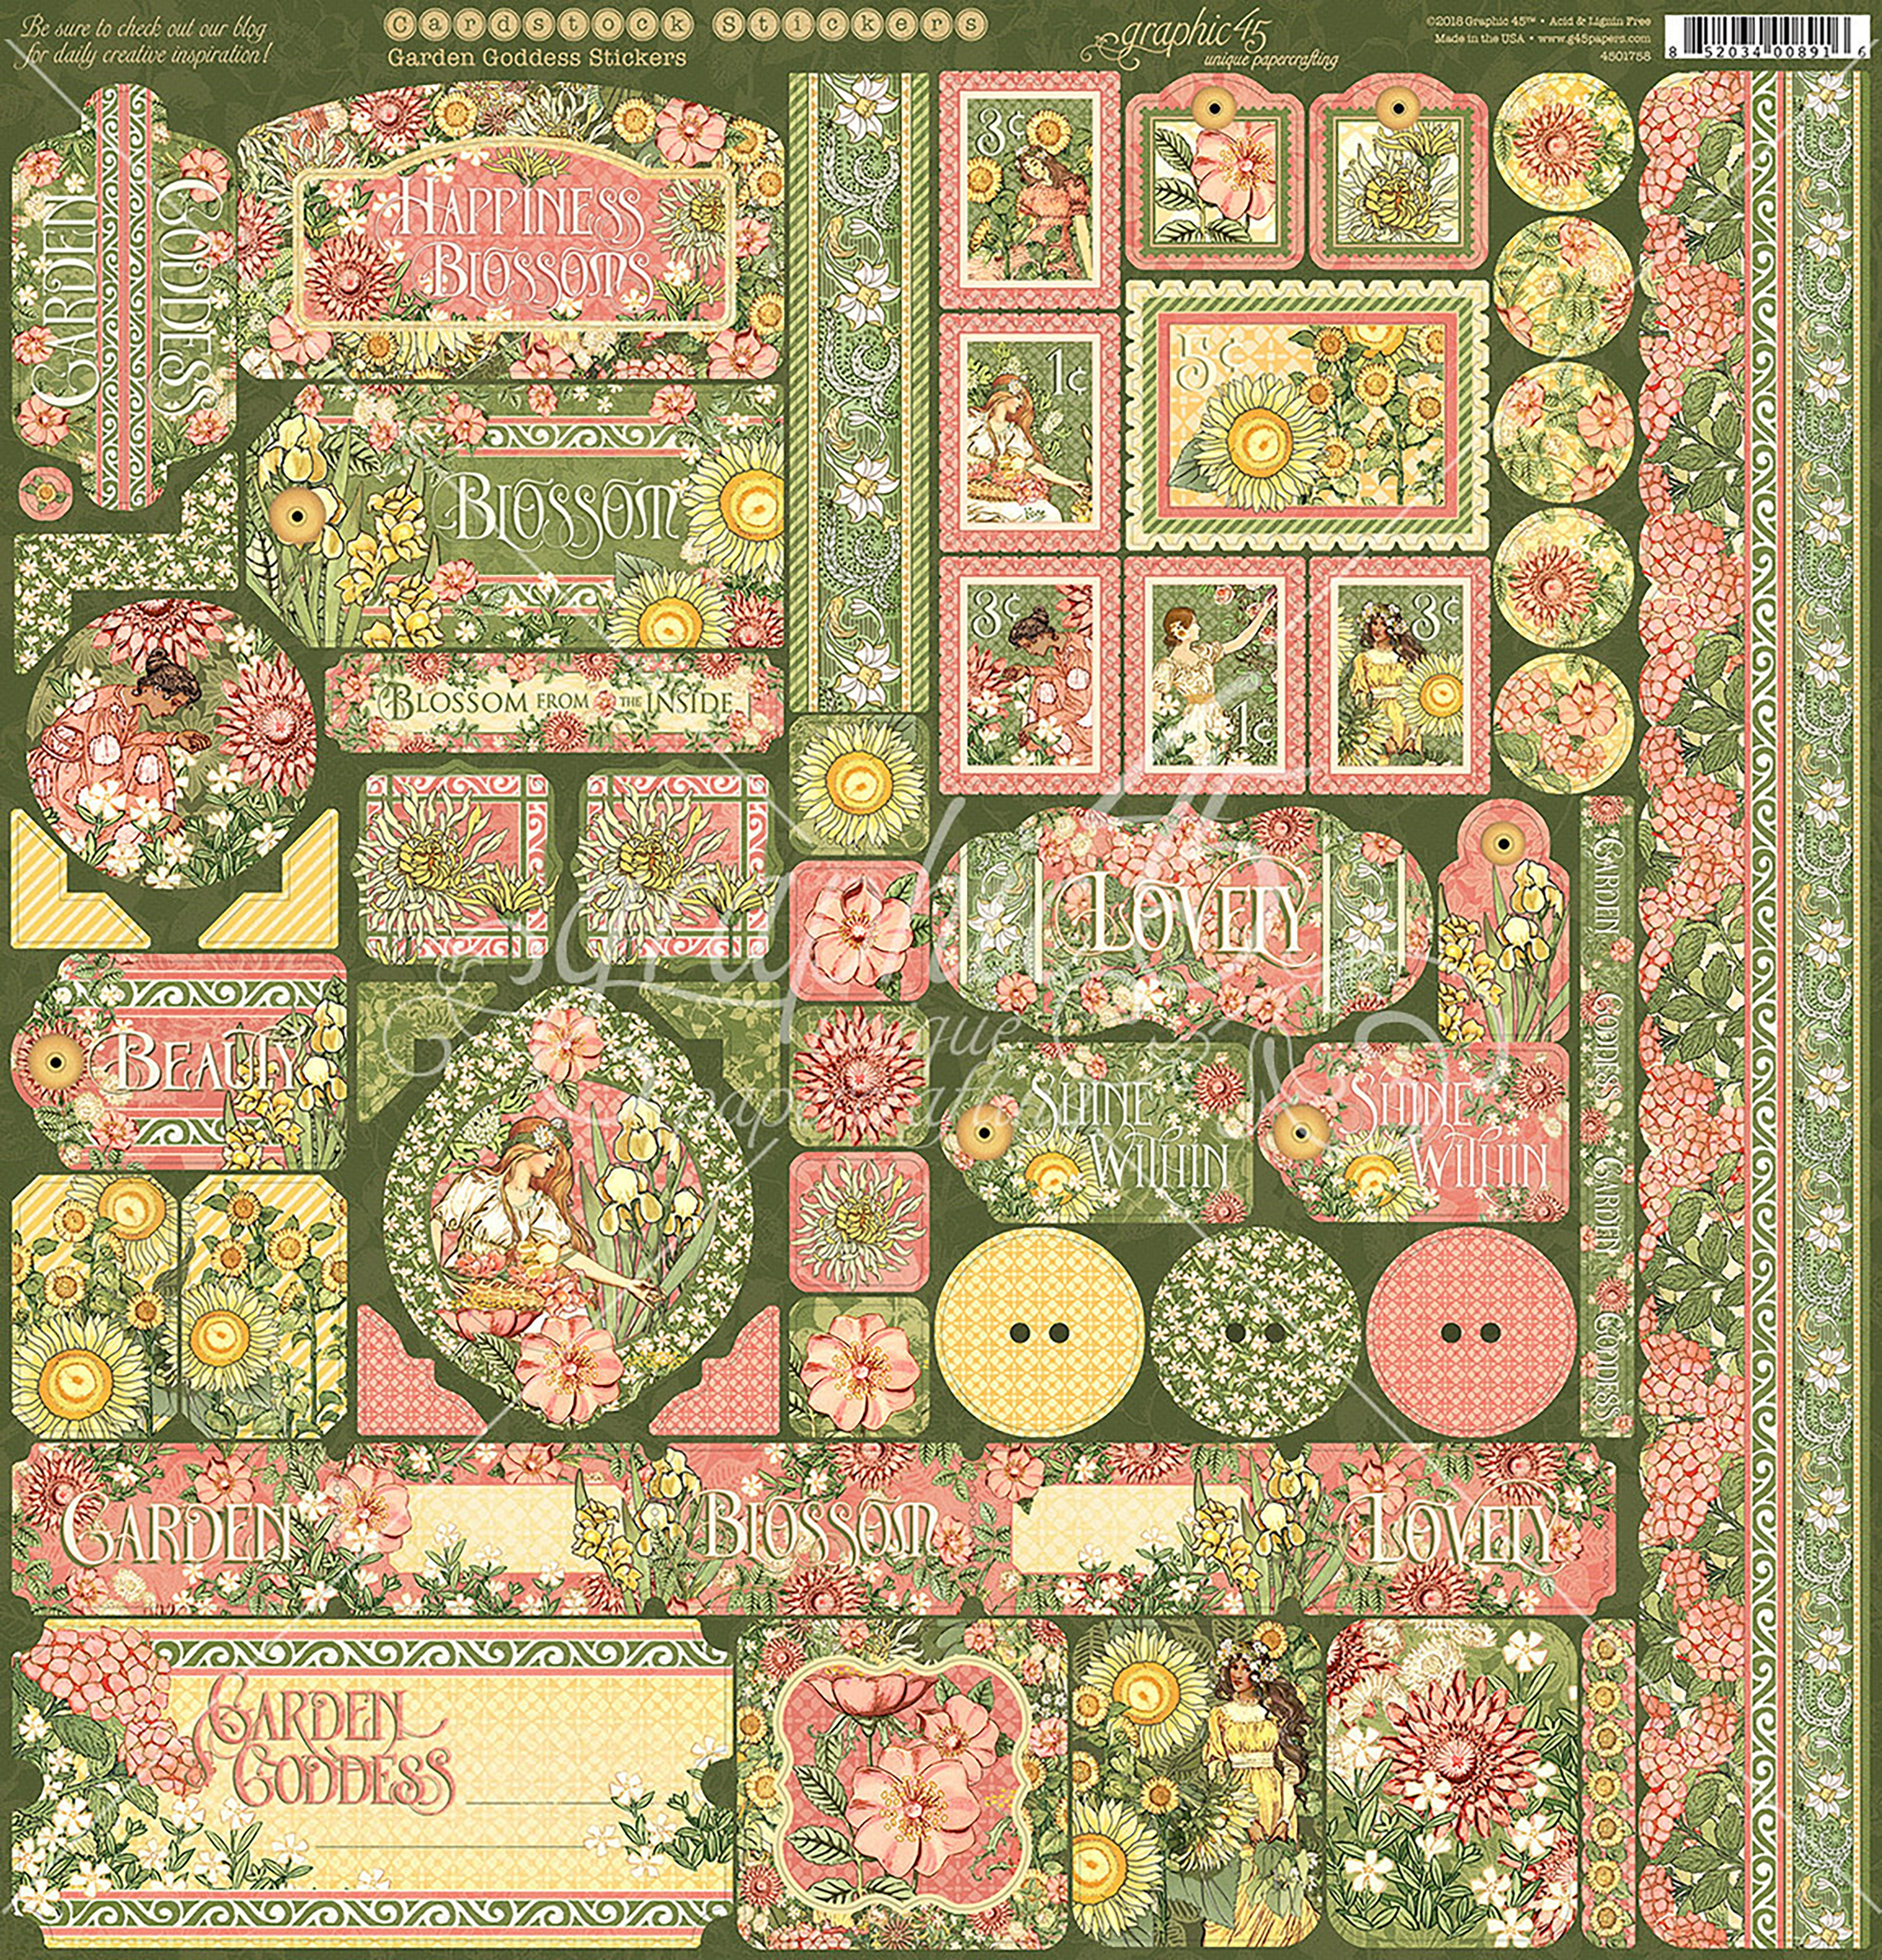 Garden Goddess Cardstock Stickers, 12X12 (Graphic 45)